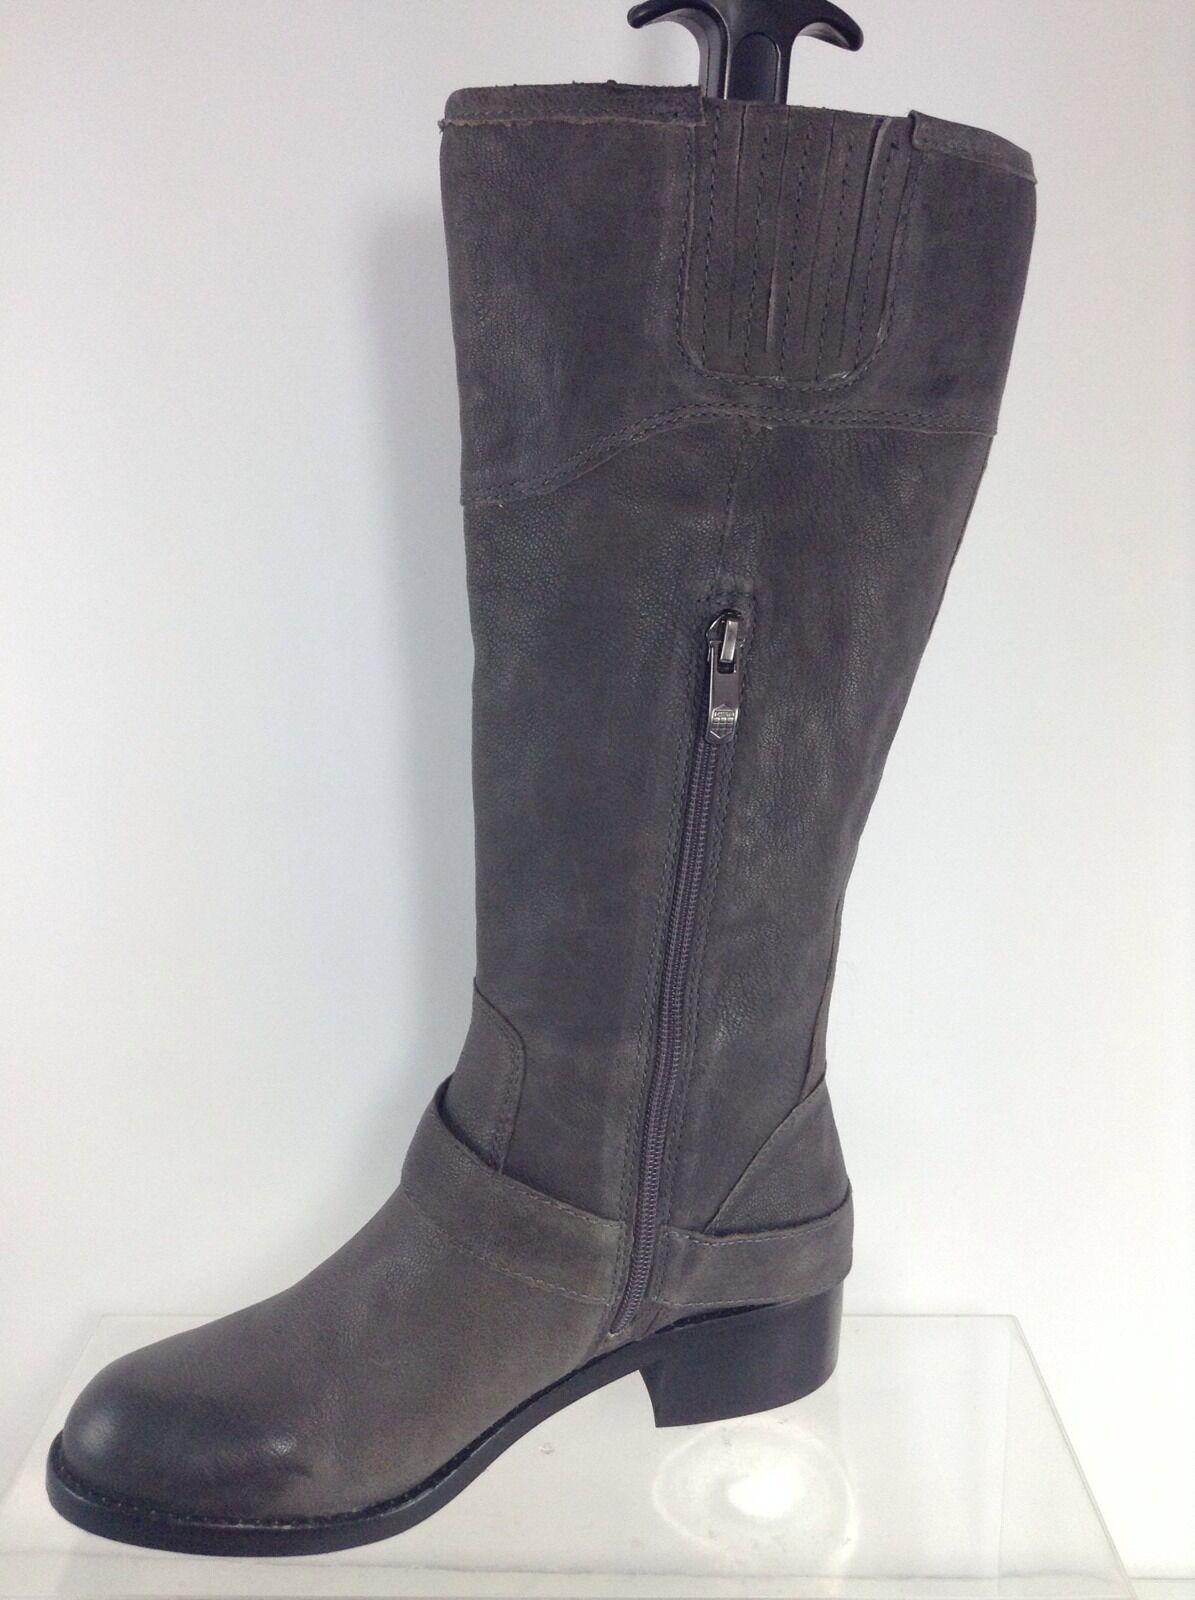 Vince Dark Camuto Damenschuhe Dark Vince Gray Leder Stiefel 6.5 M d719fe